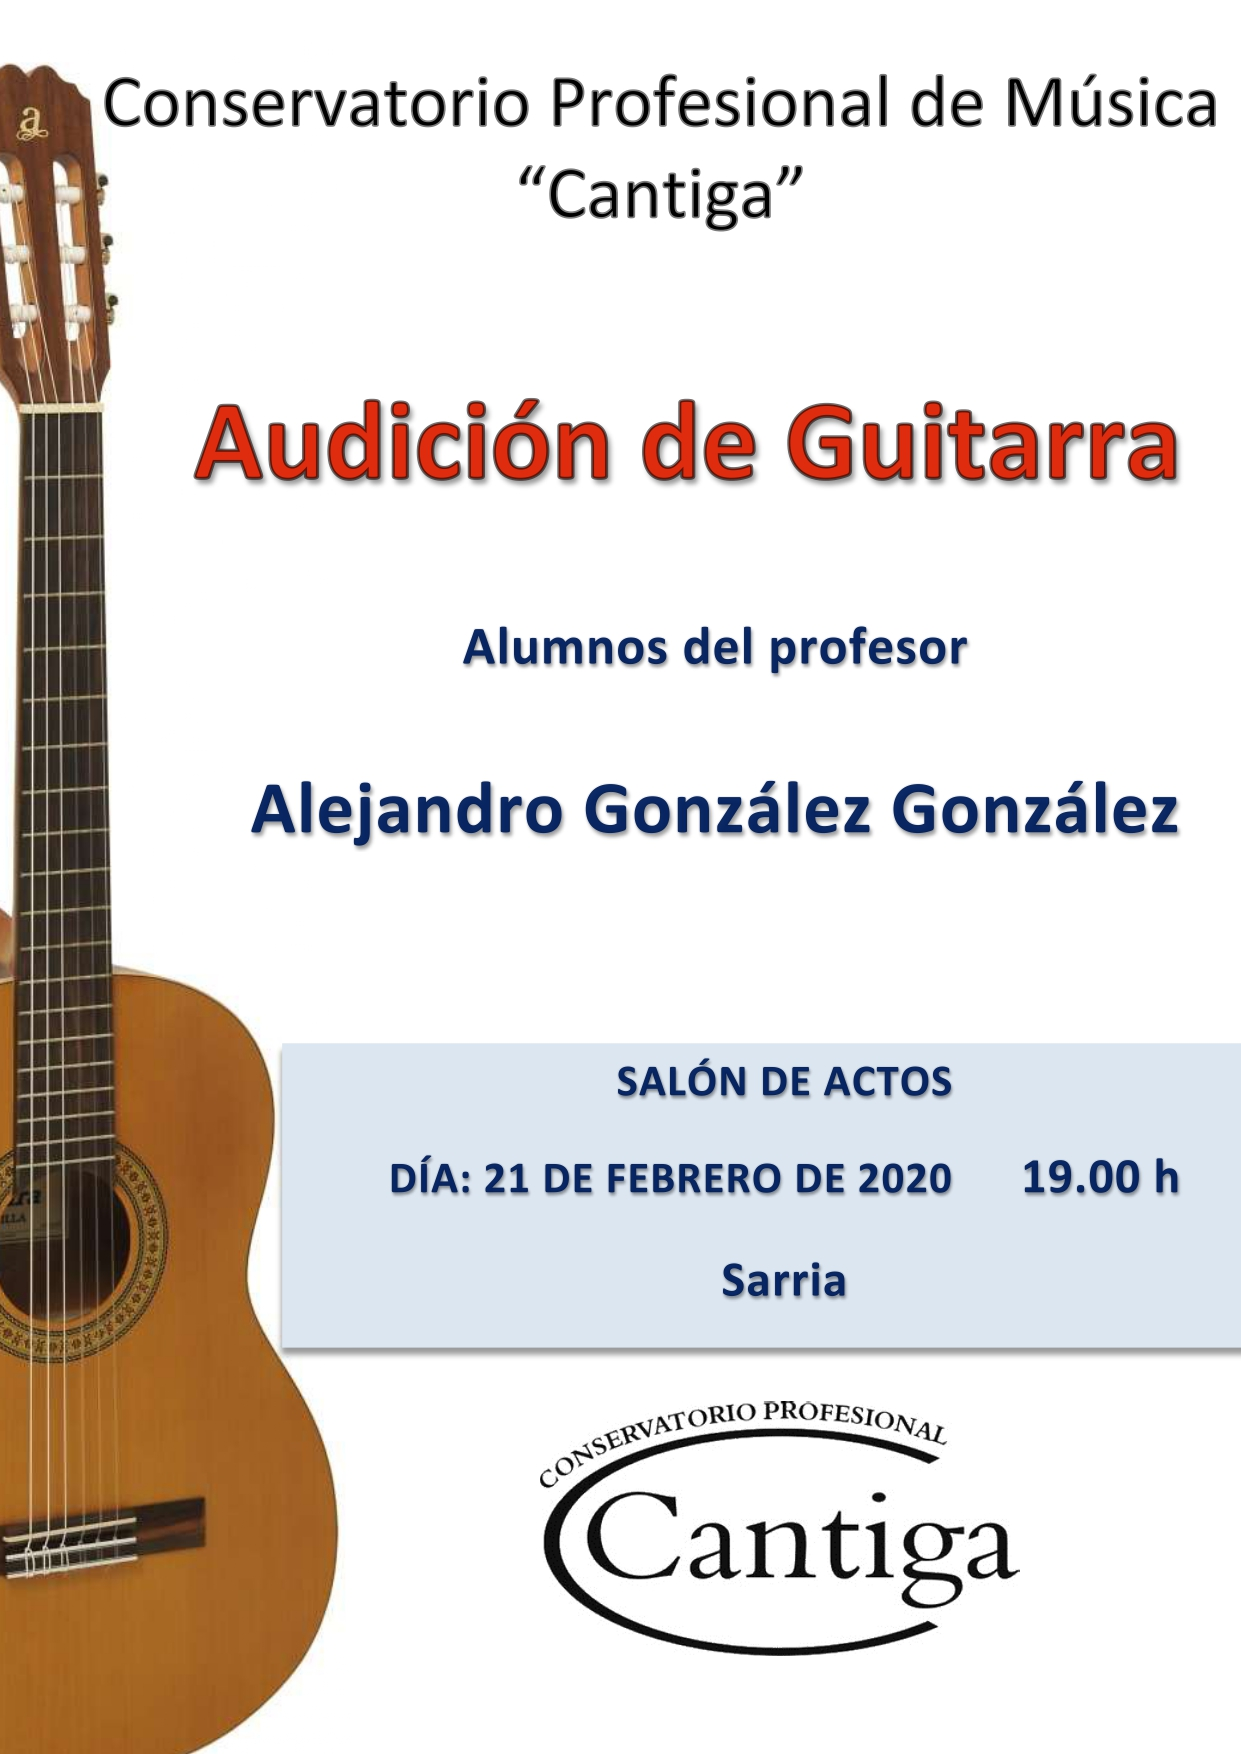 Audición guitarra 2020_pages-to-jpg-0001